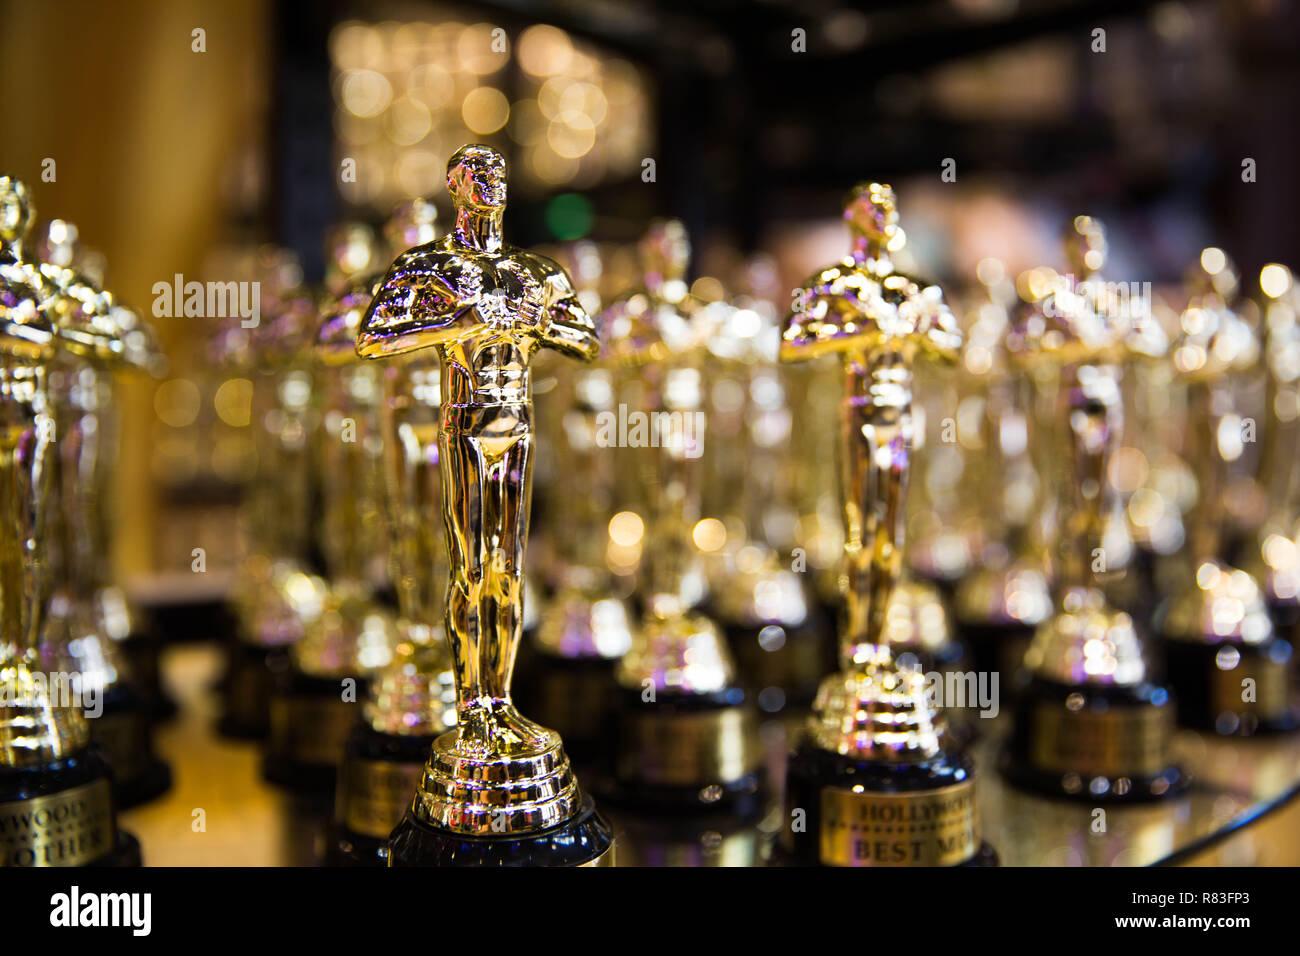 Oscar award. Hollywood, CA/ USA - July 26, 2018: Oscar golden awards in a souvenir store on Hollywood Boulevard - Stock Image